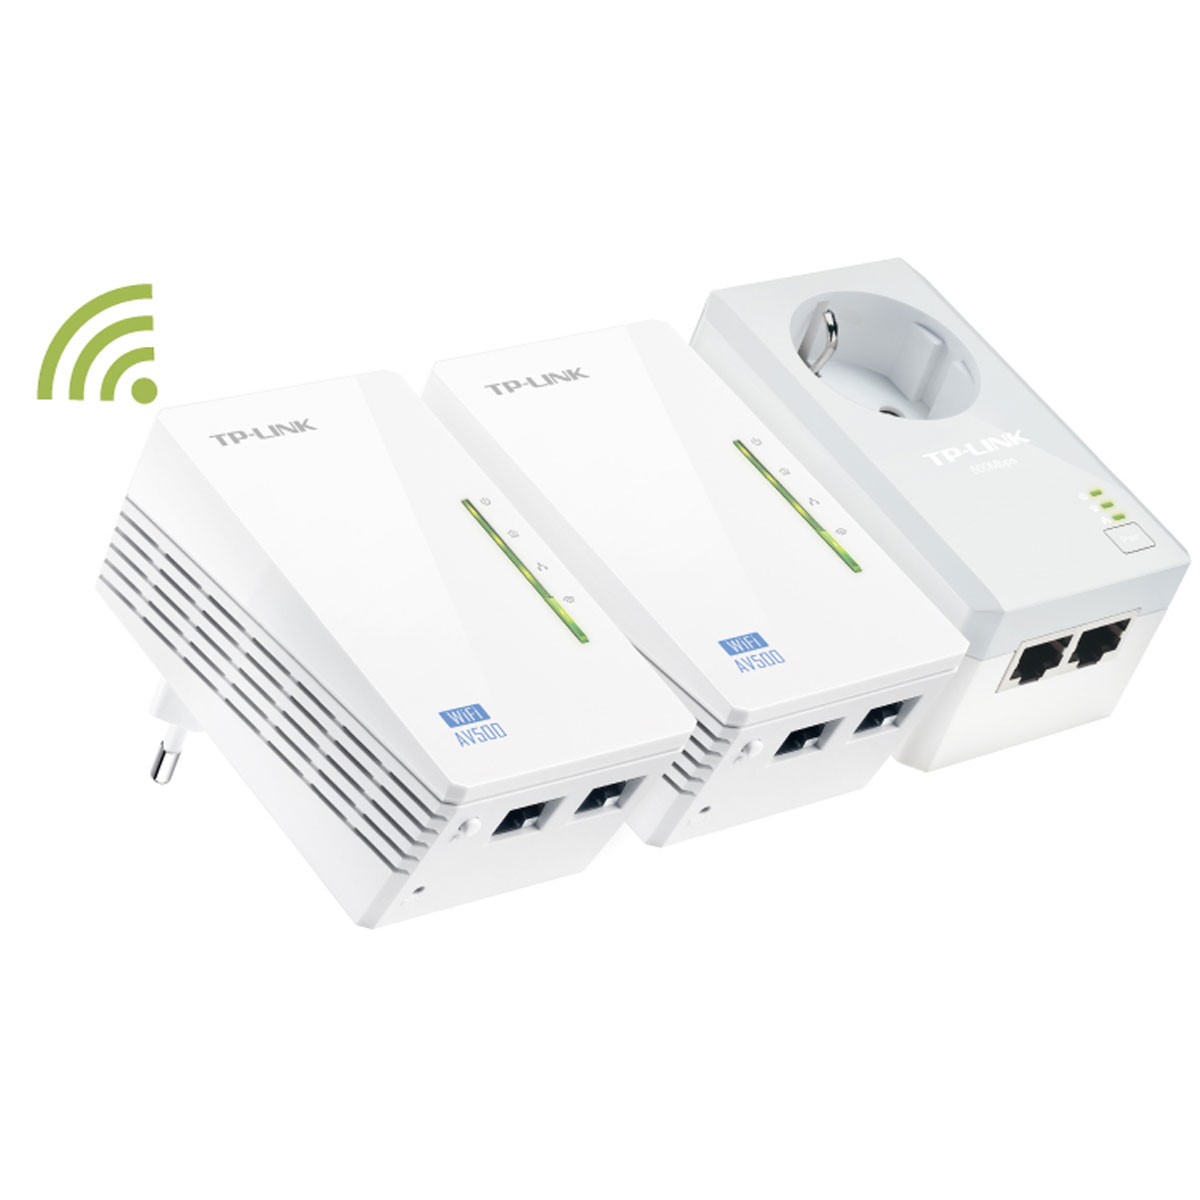 CPL TP-LINK TL-WPA4226T KIT Adaptateur CPL 500 Mbps + 2 adaptateurs CPL Wi-Fi N 300 Mbps 2 ports